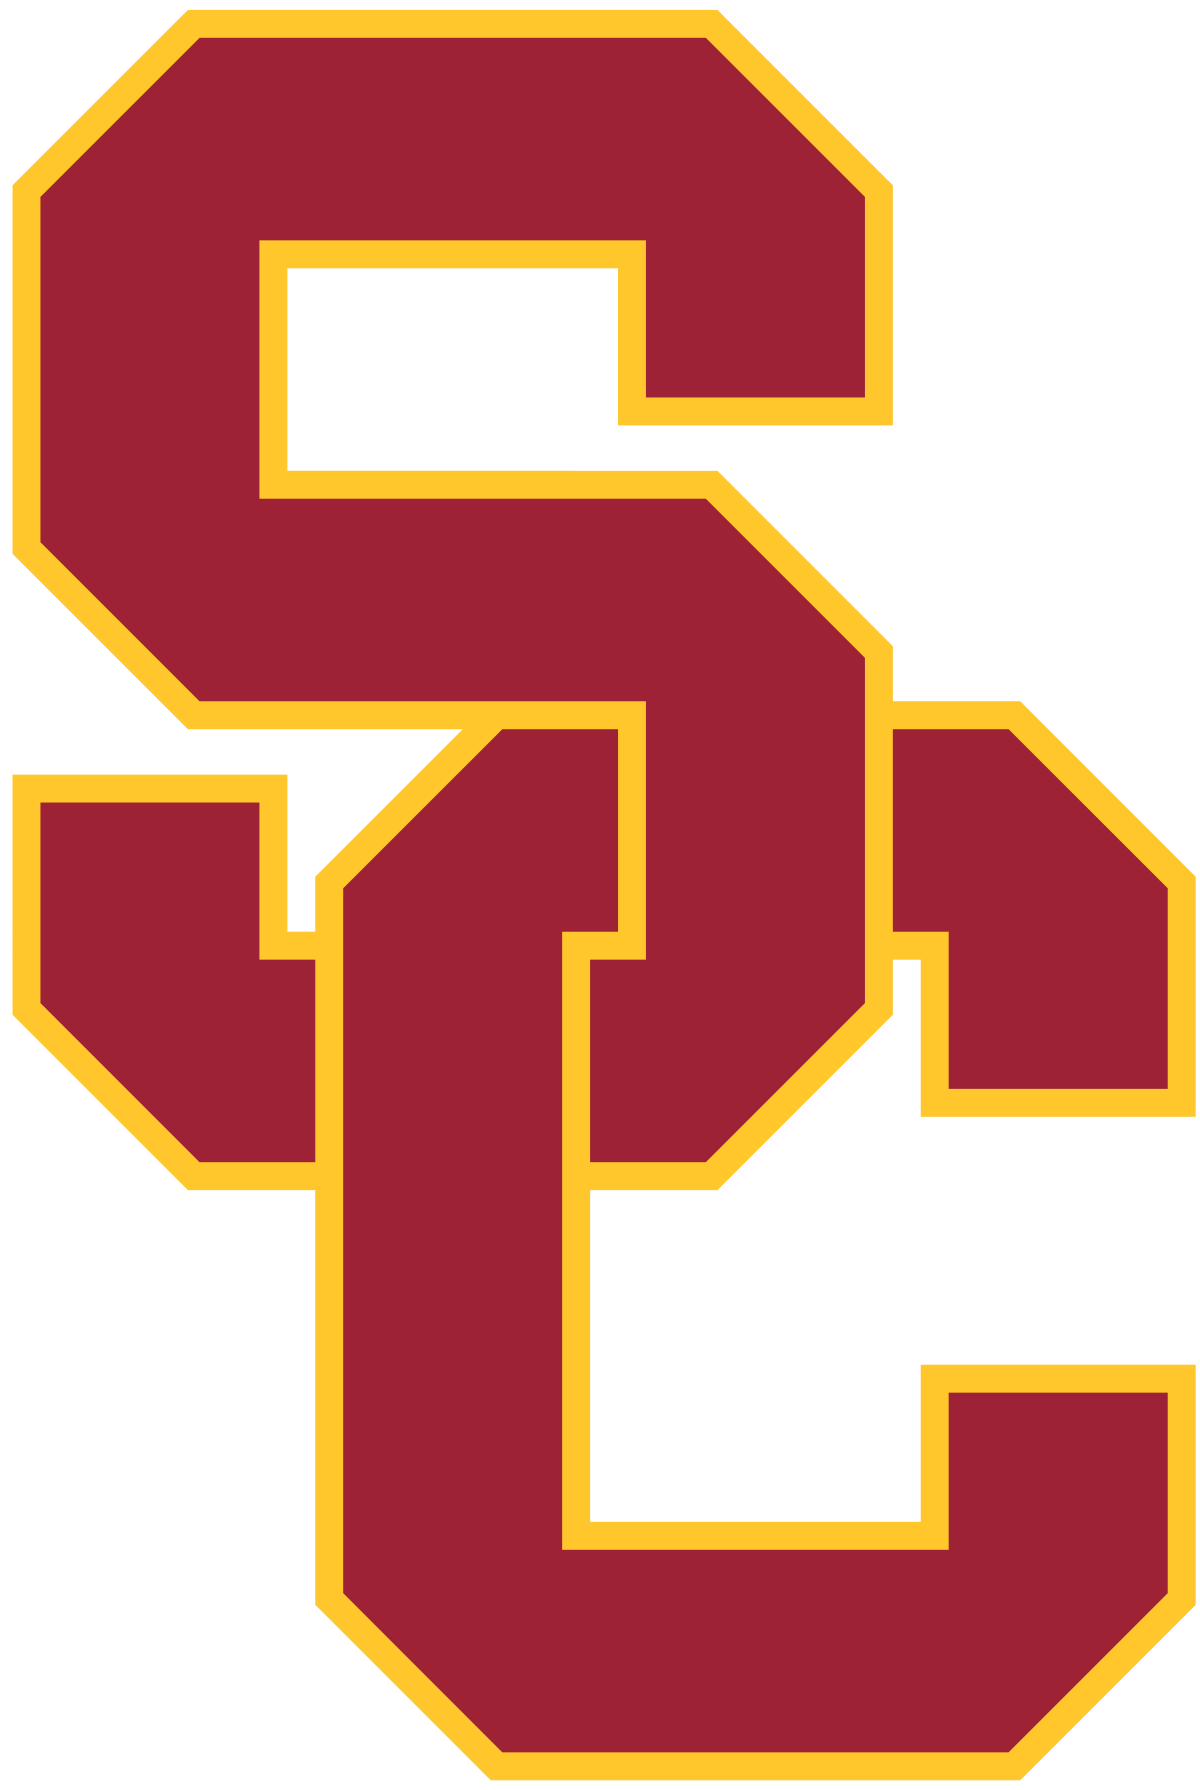 Usc Trojans Logo College Football Logos Usc Trojans Logo Usc Basketball